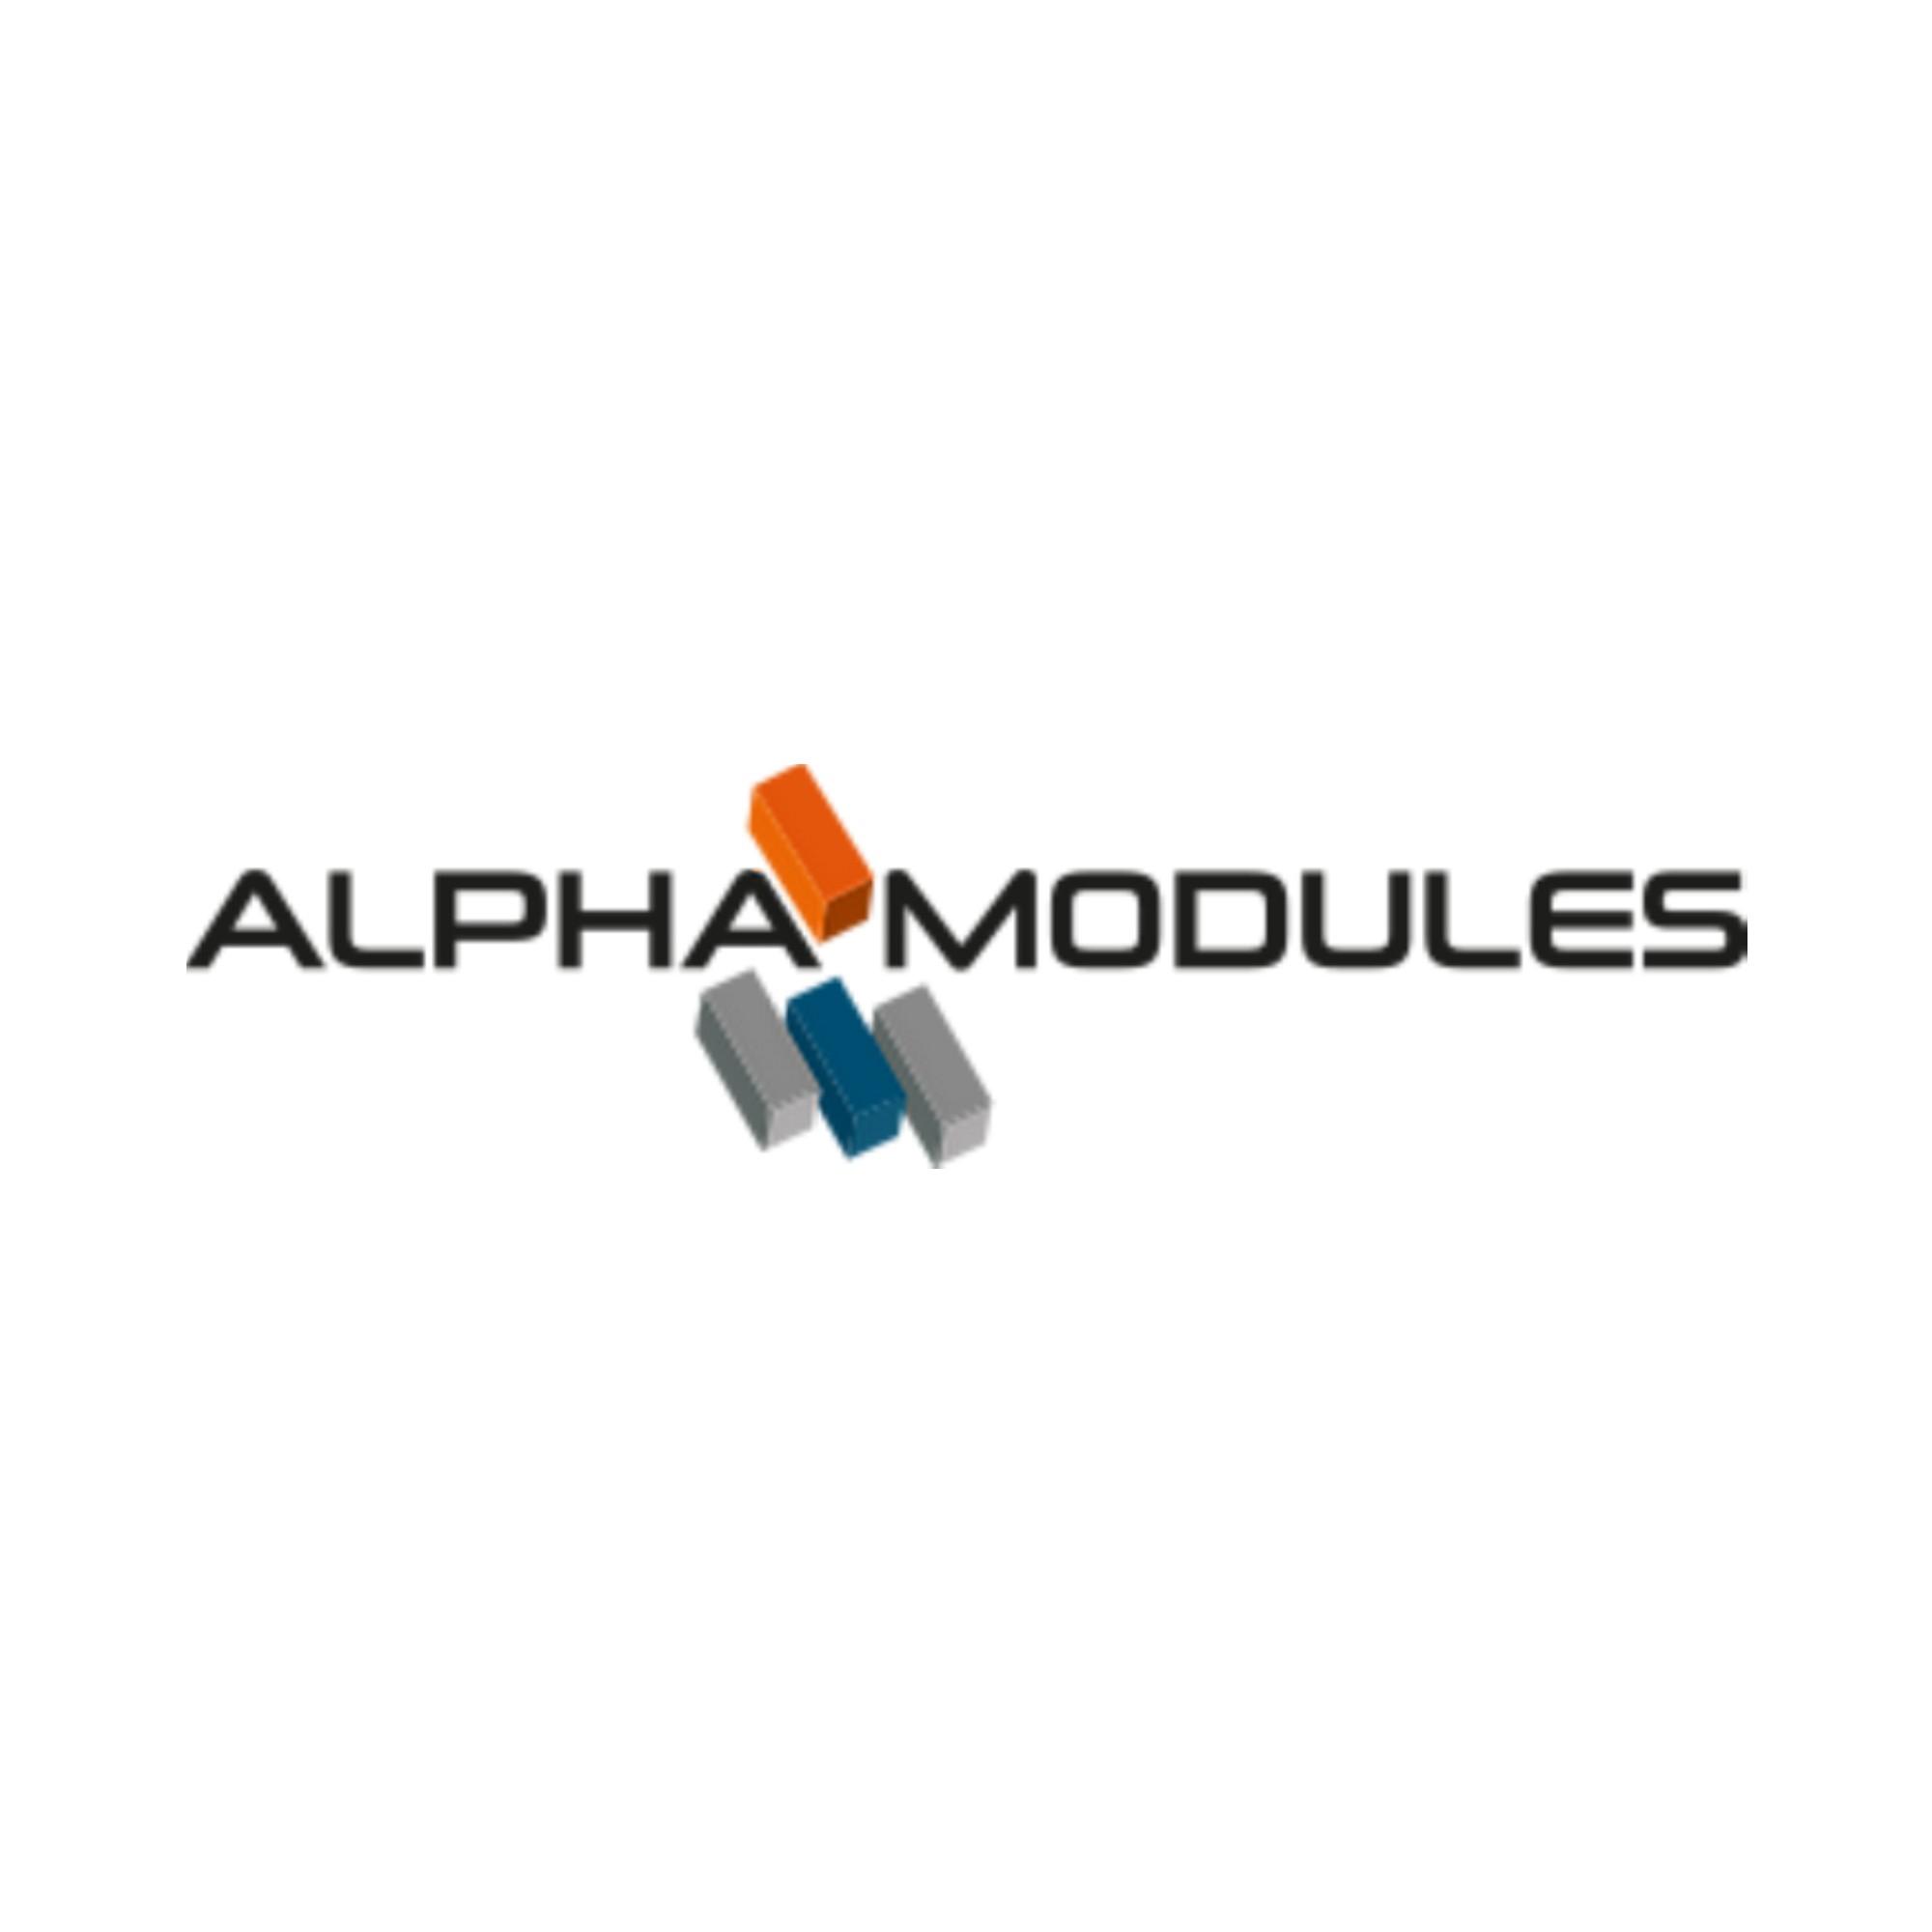 AlphaModules